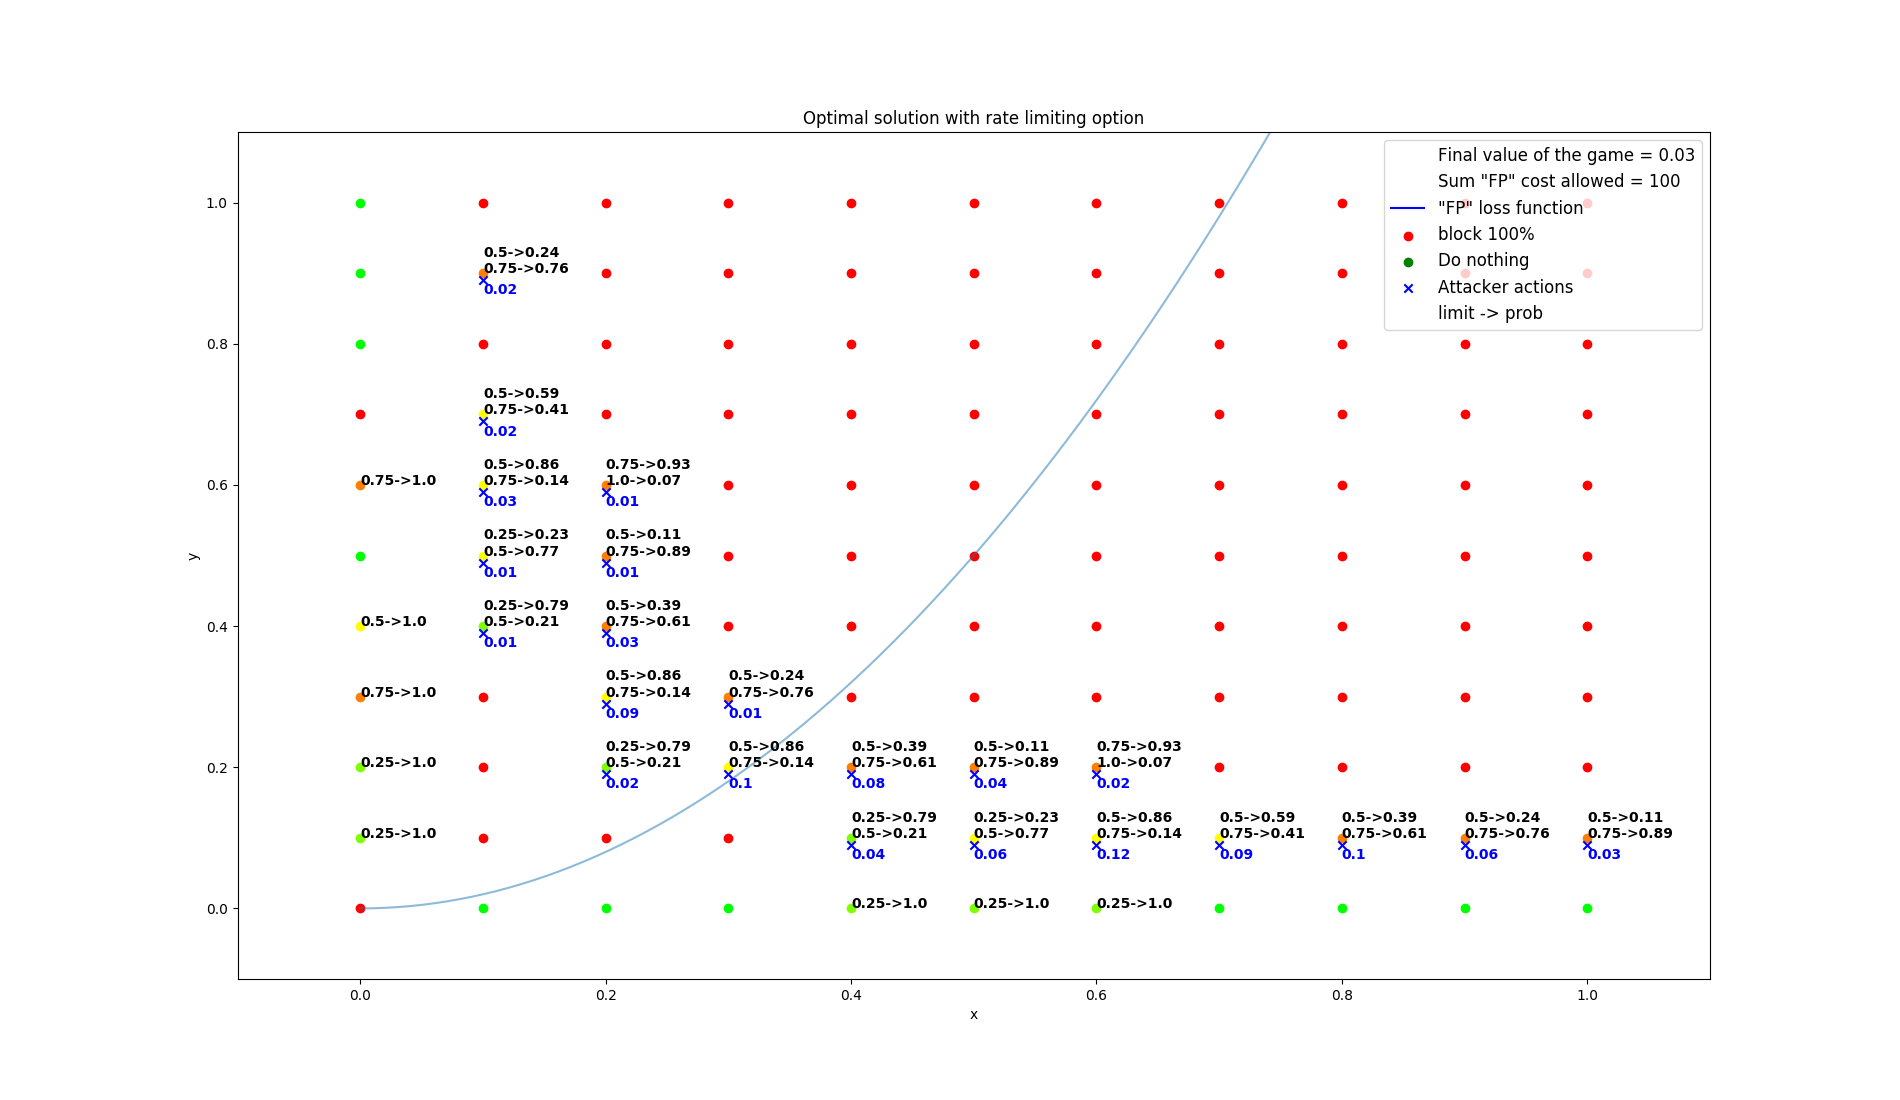 results/optimal/false_positive_constraint/37-summarization.png